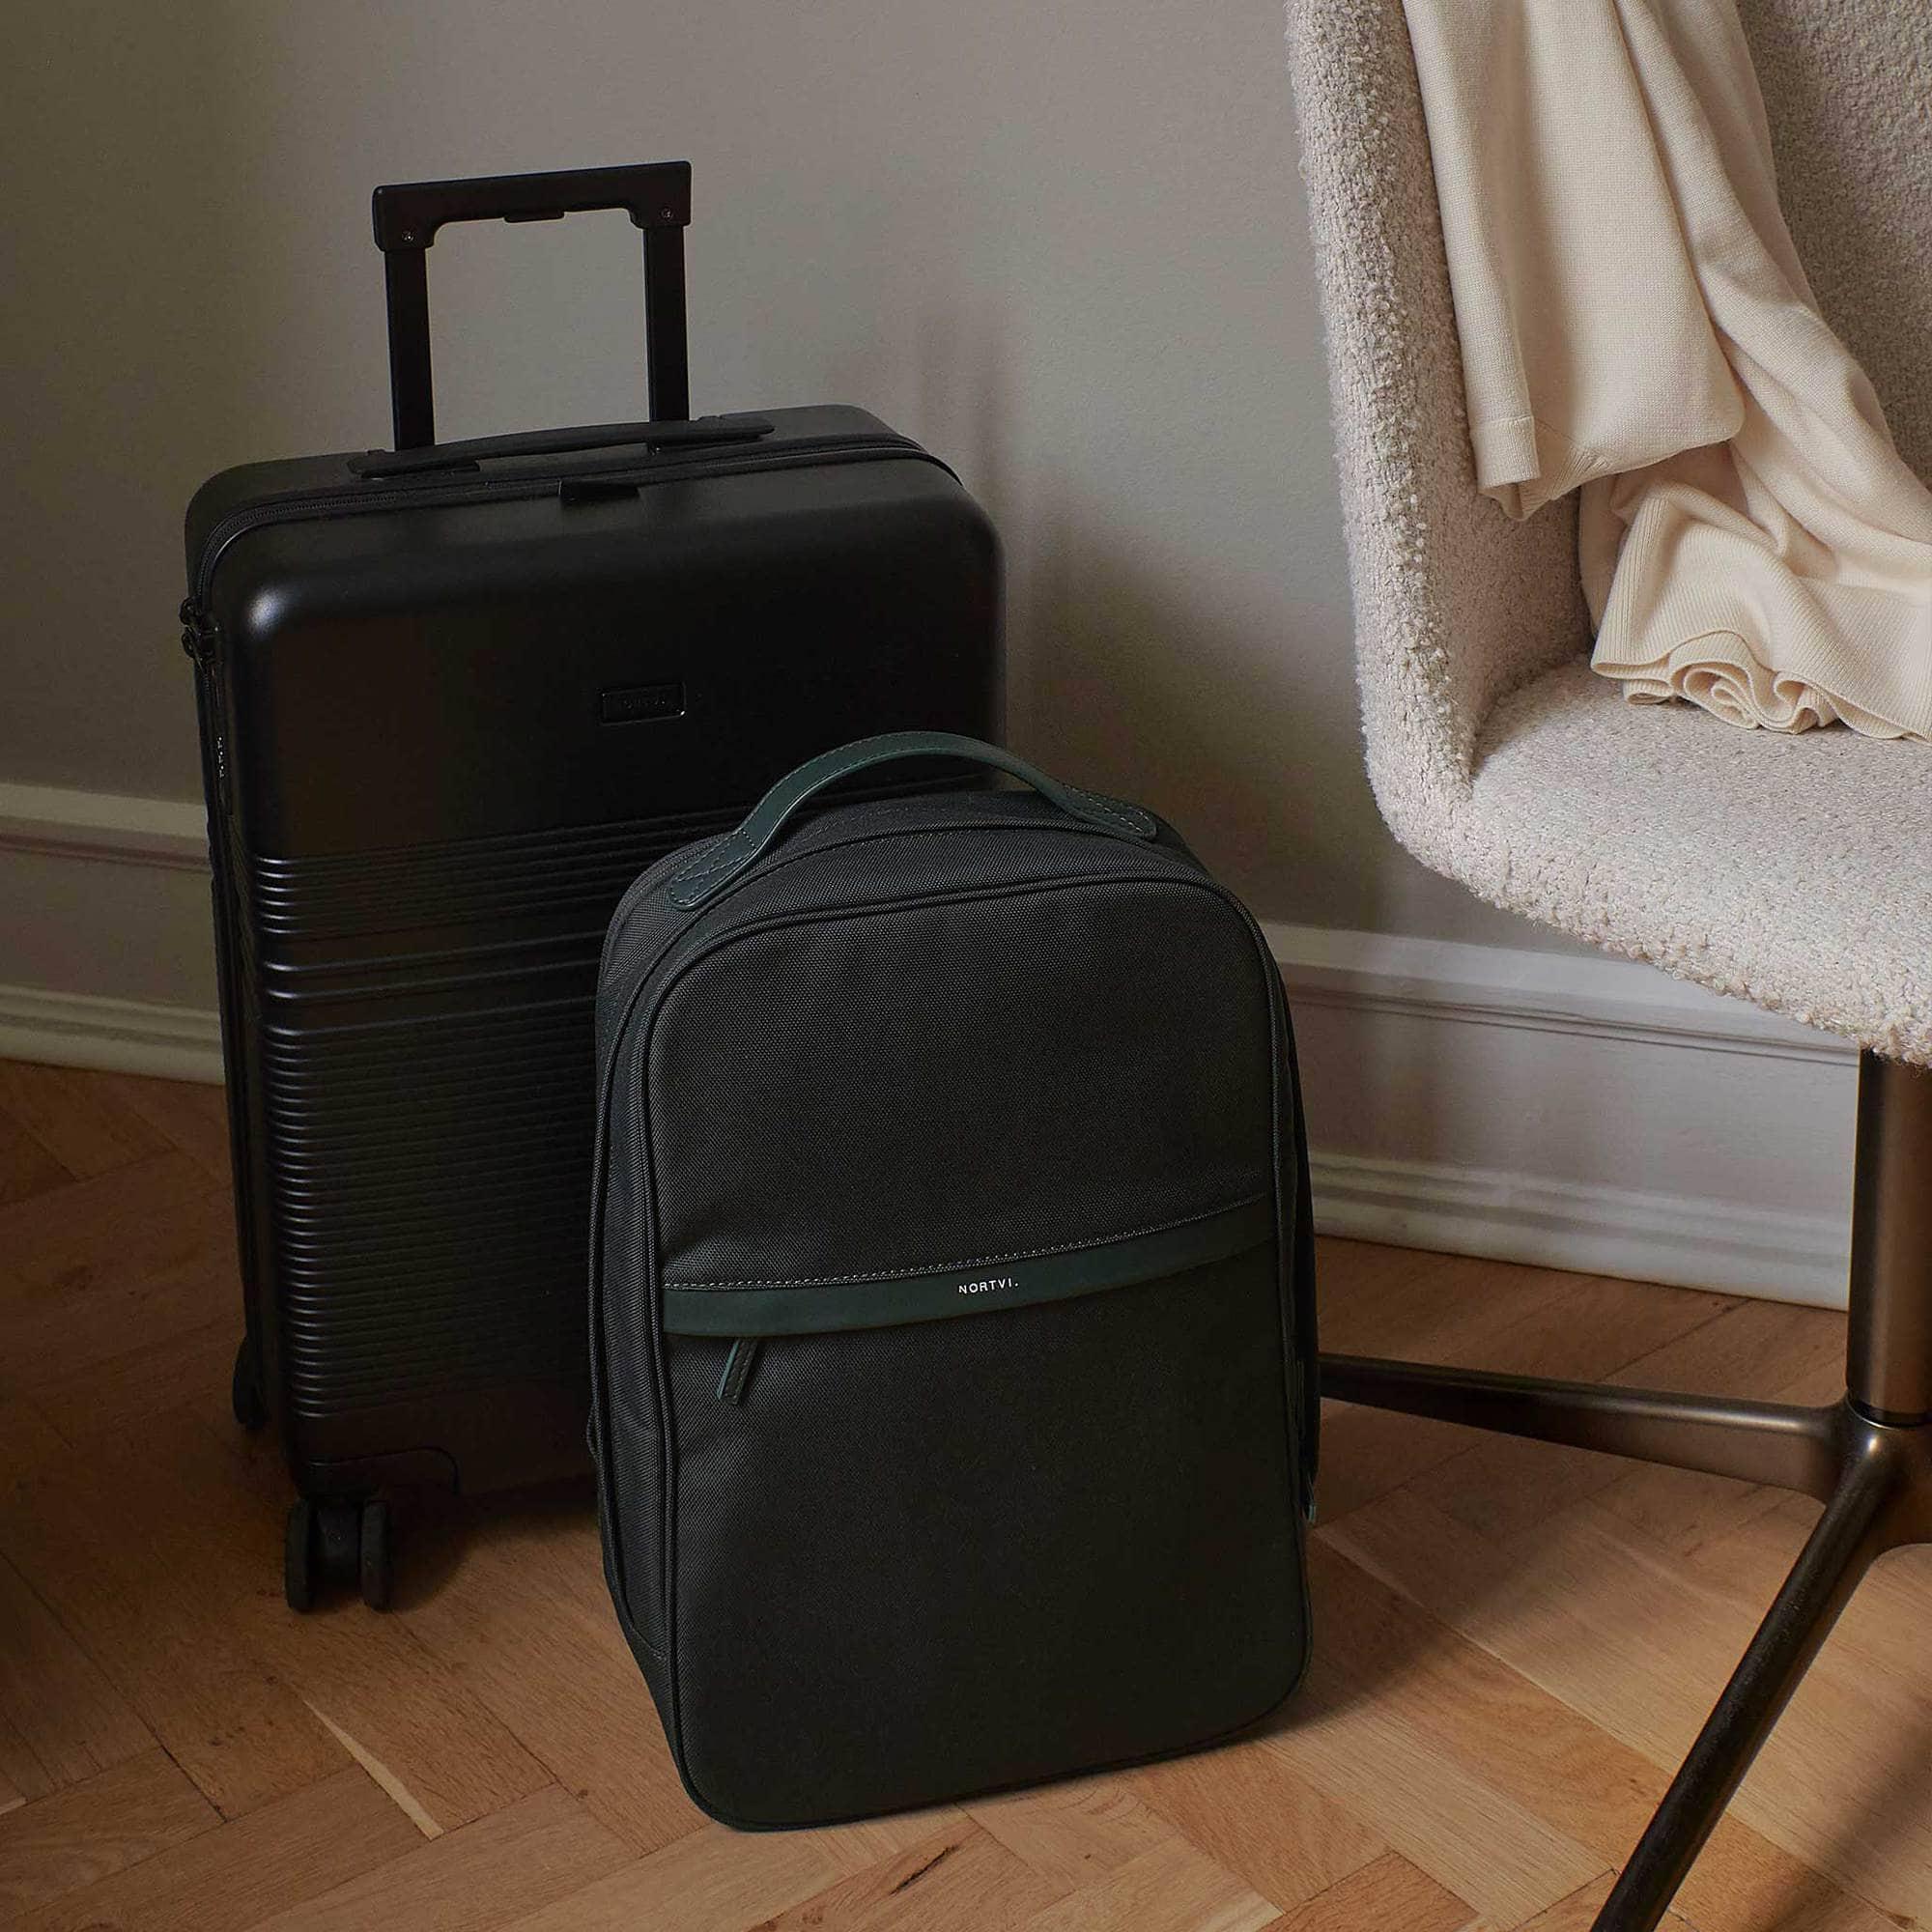 Backpack rugzak groen NORTVI